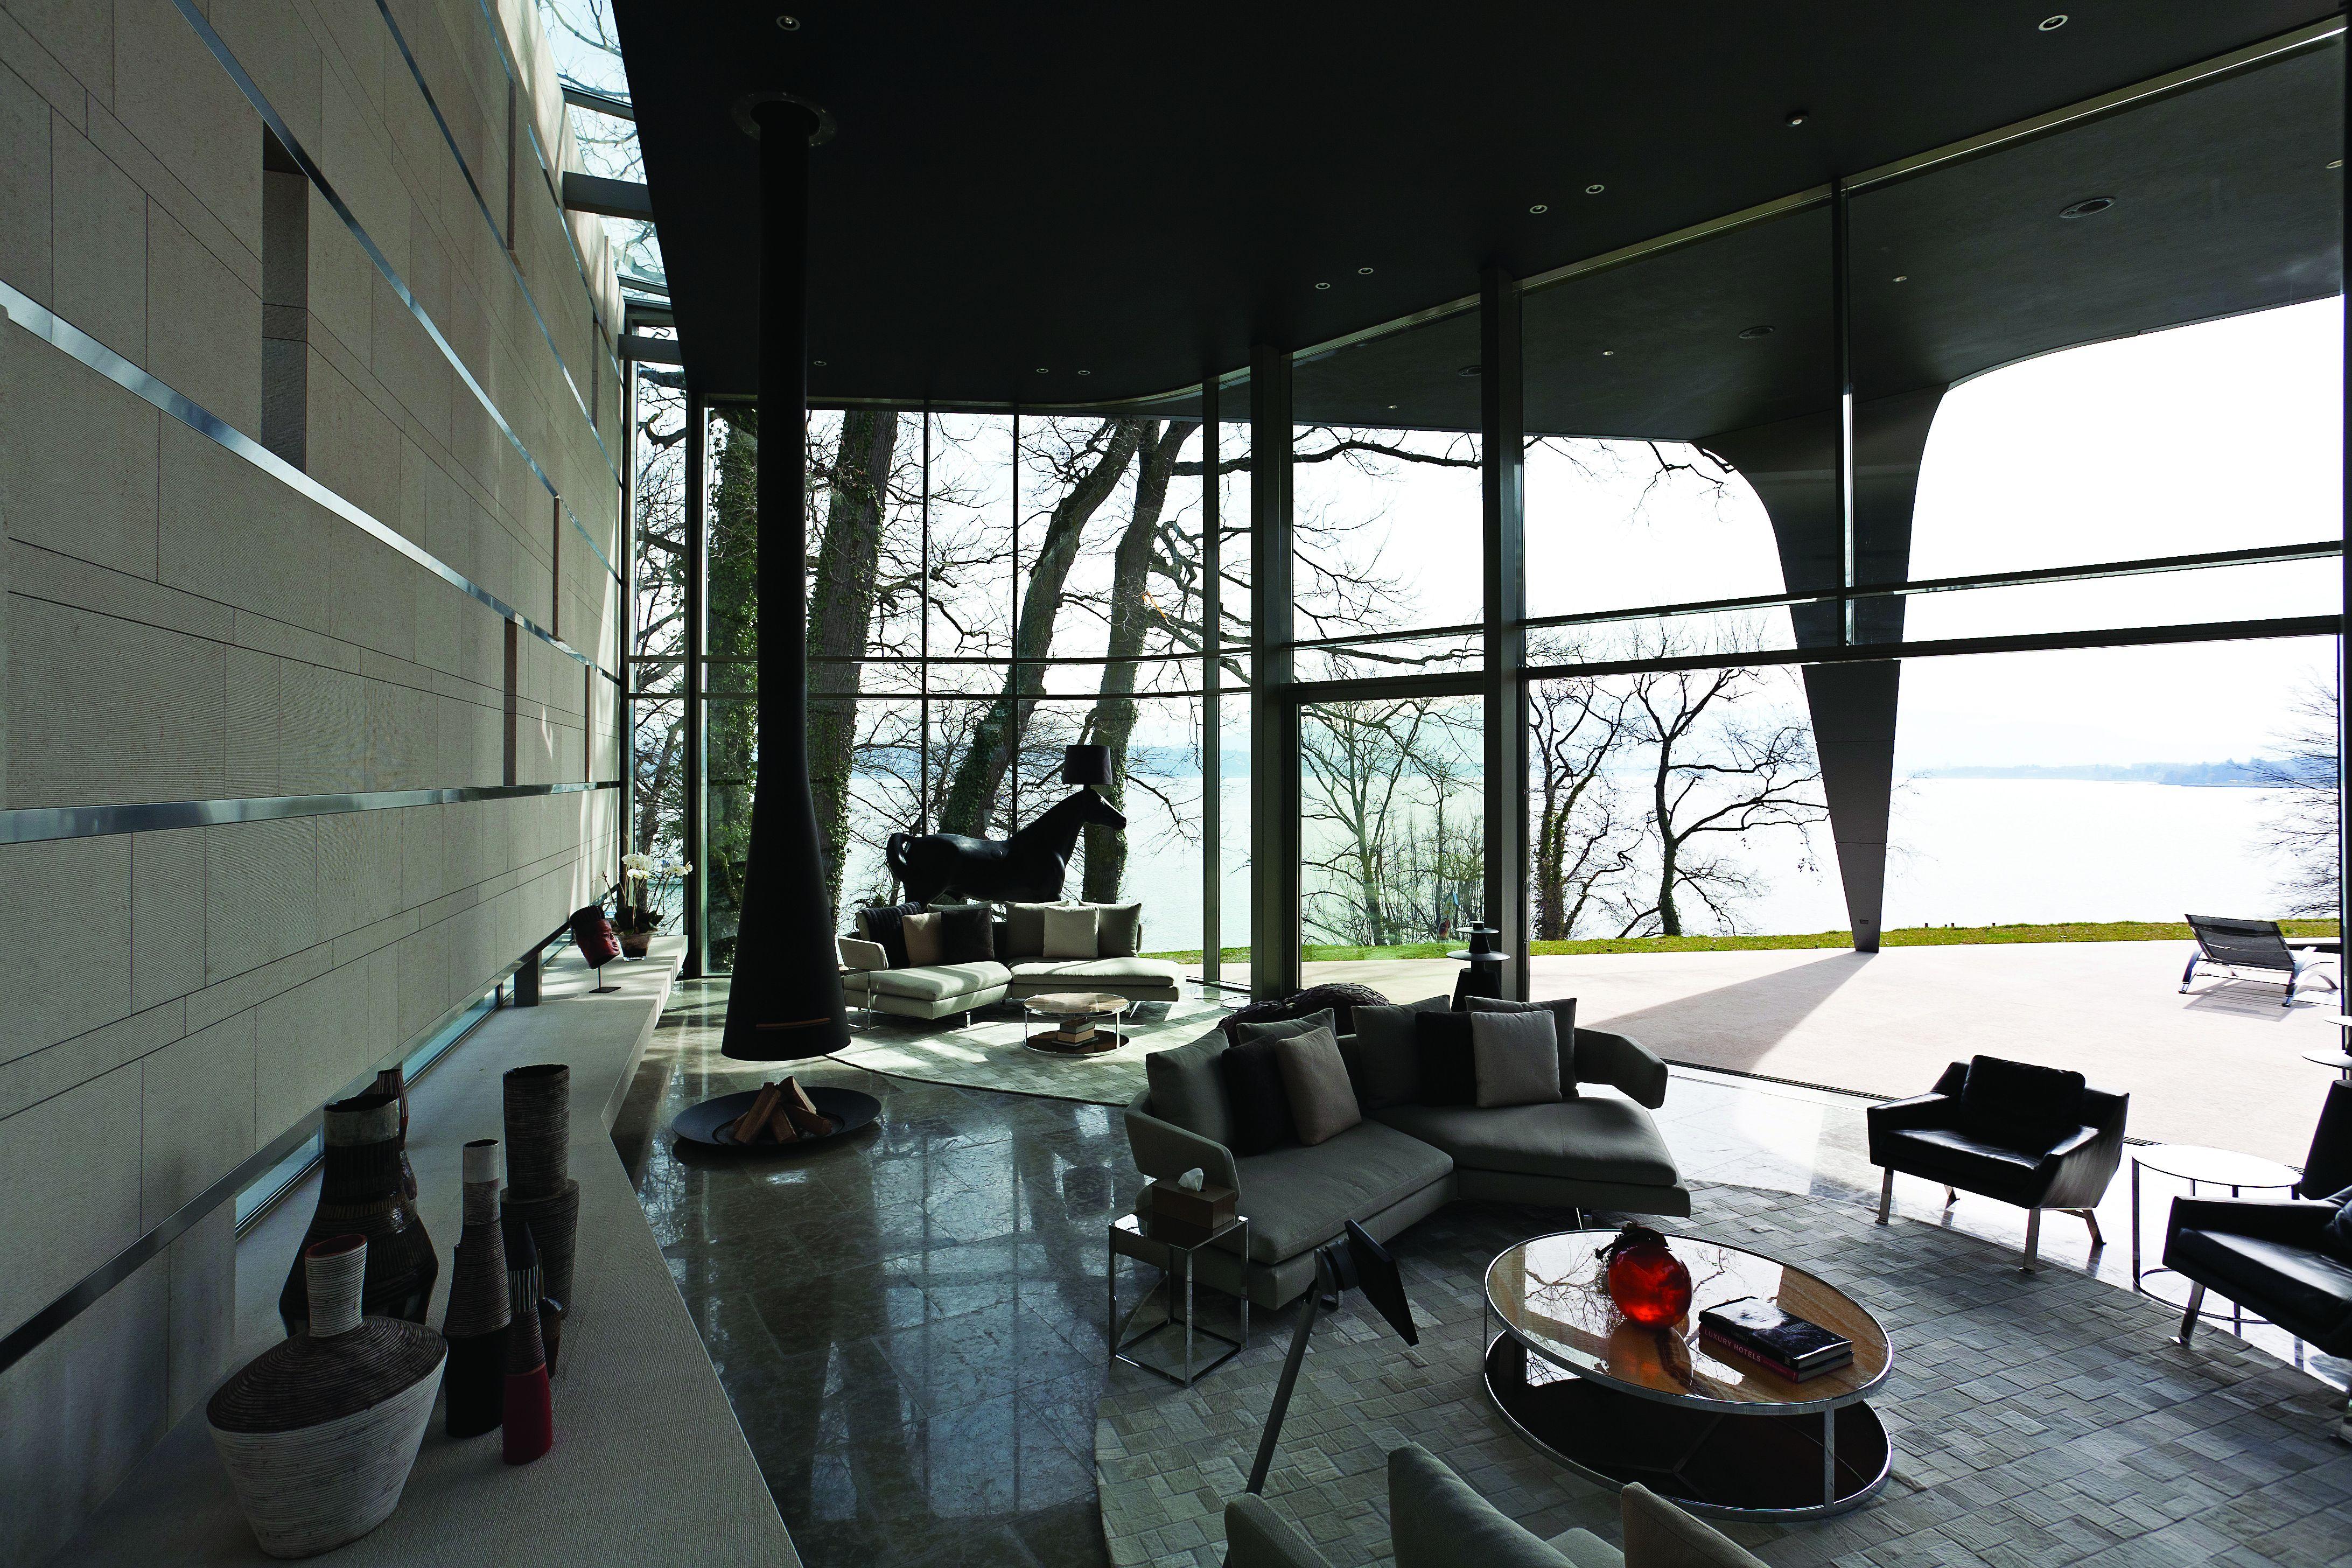 Switzerland Luxury Homes And Switzerland Luxury Real